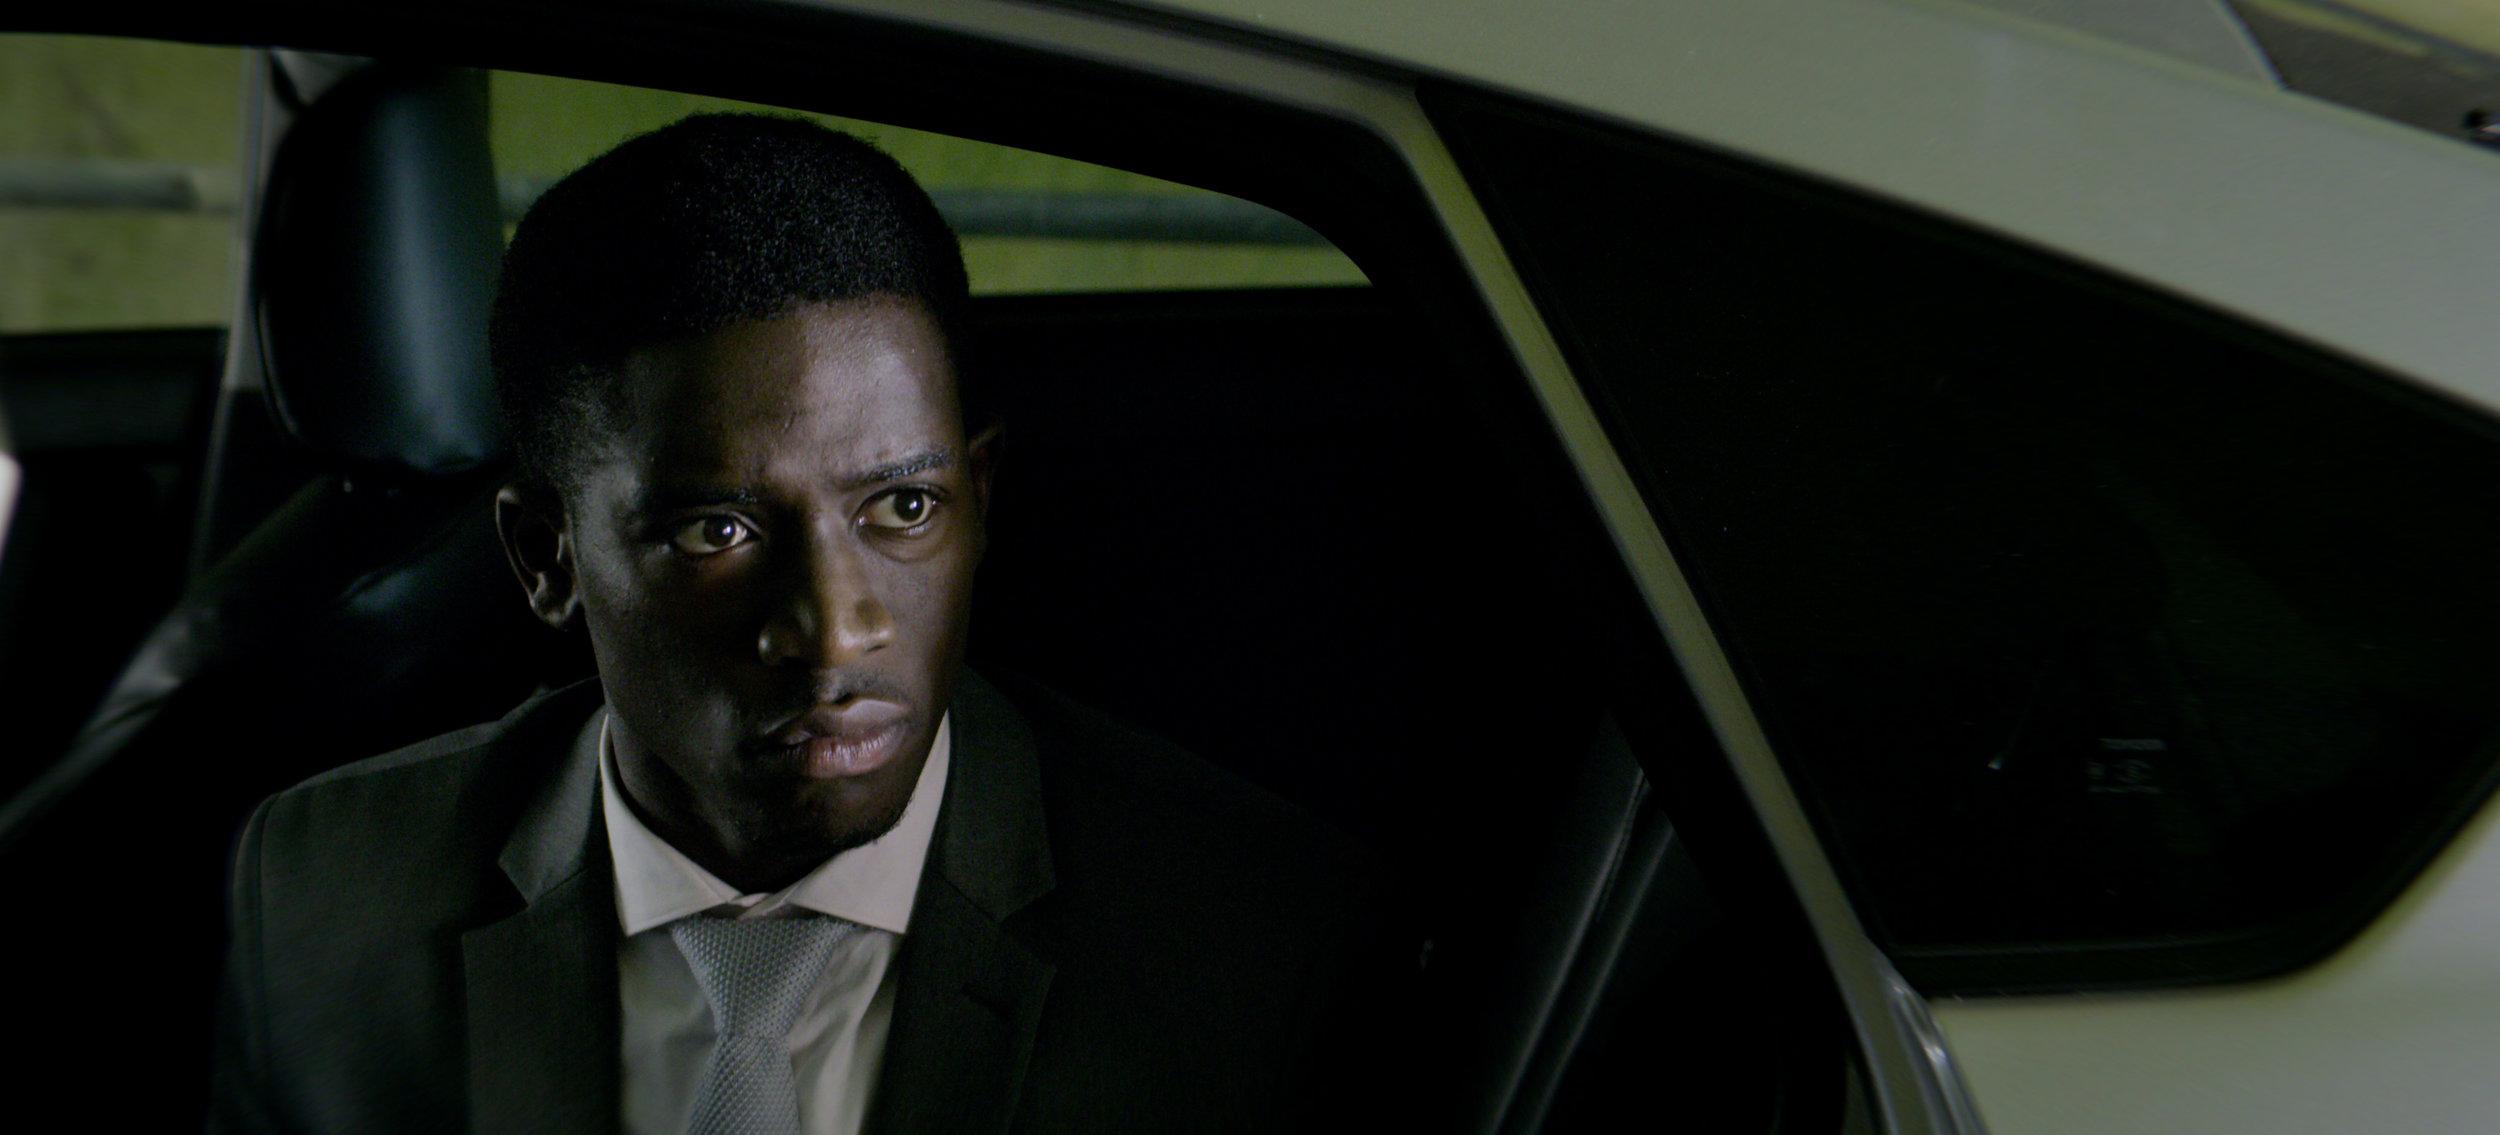 Famson Idris in Black Mirror Season 5 - Smithereens on NETFLIX